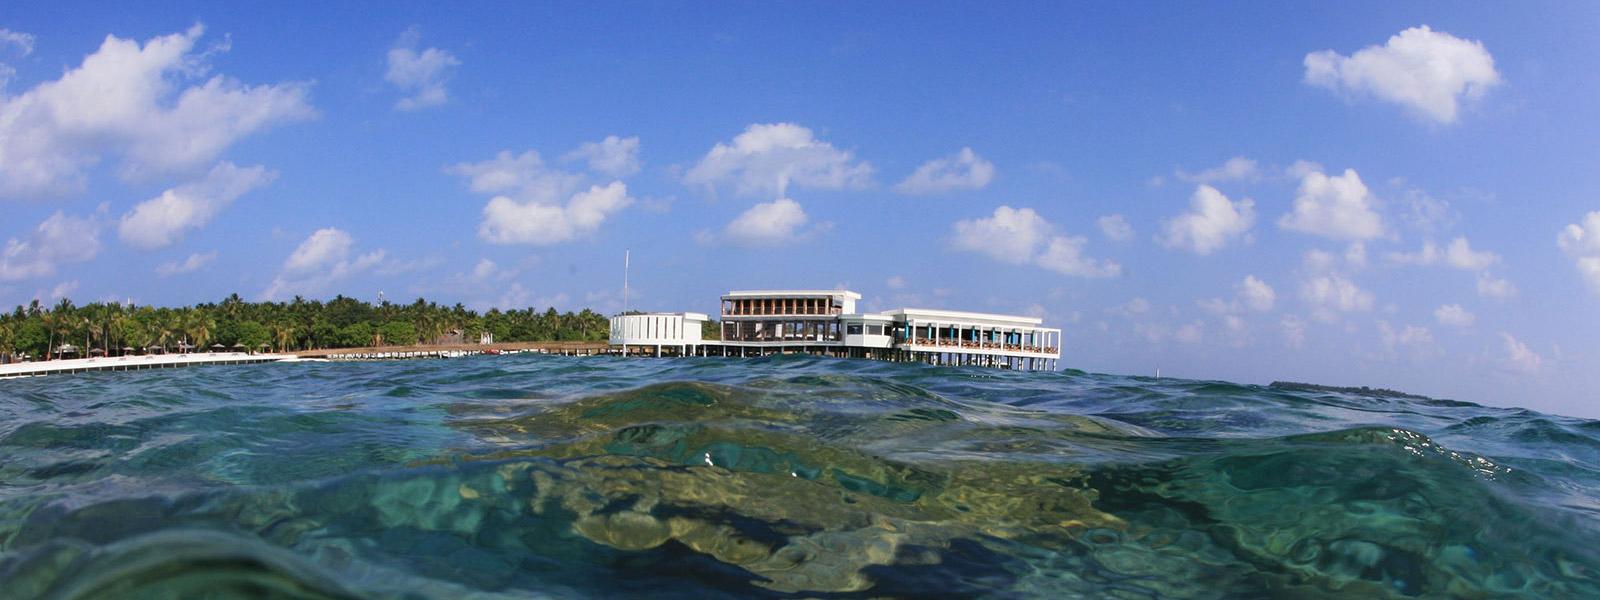 Maldives Luxury Diving Resort